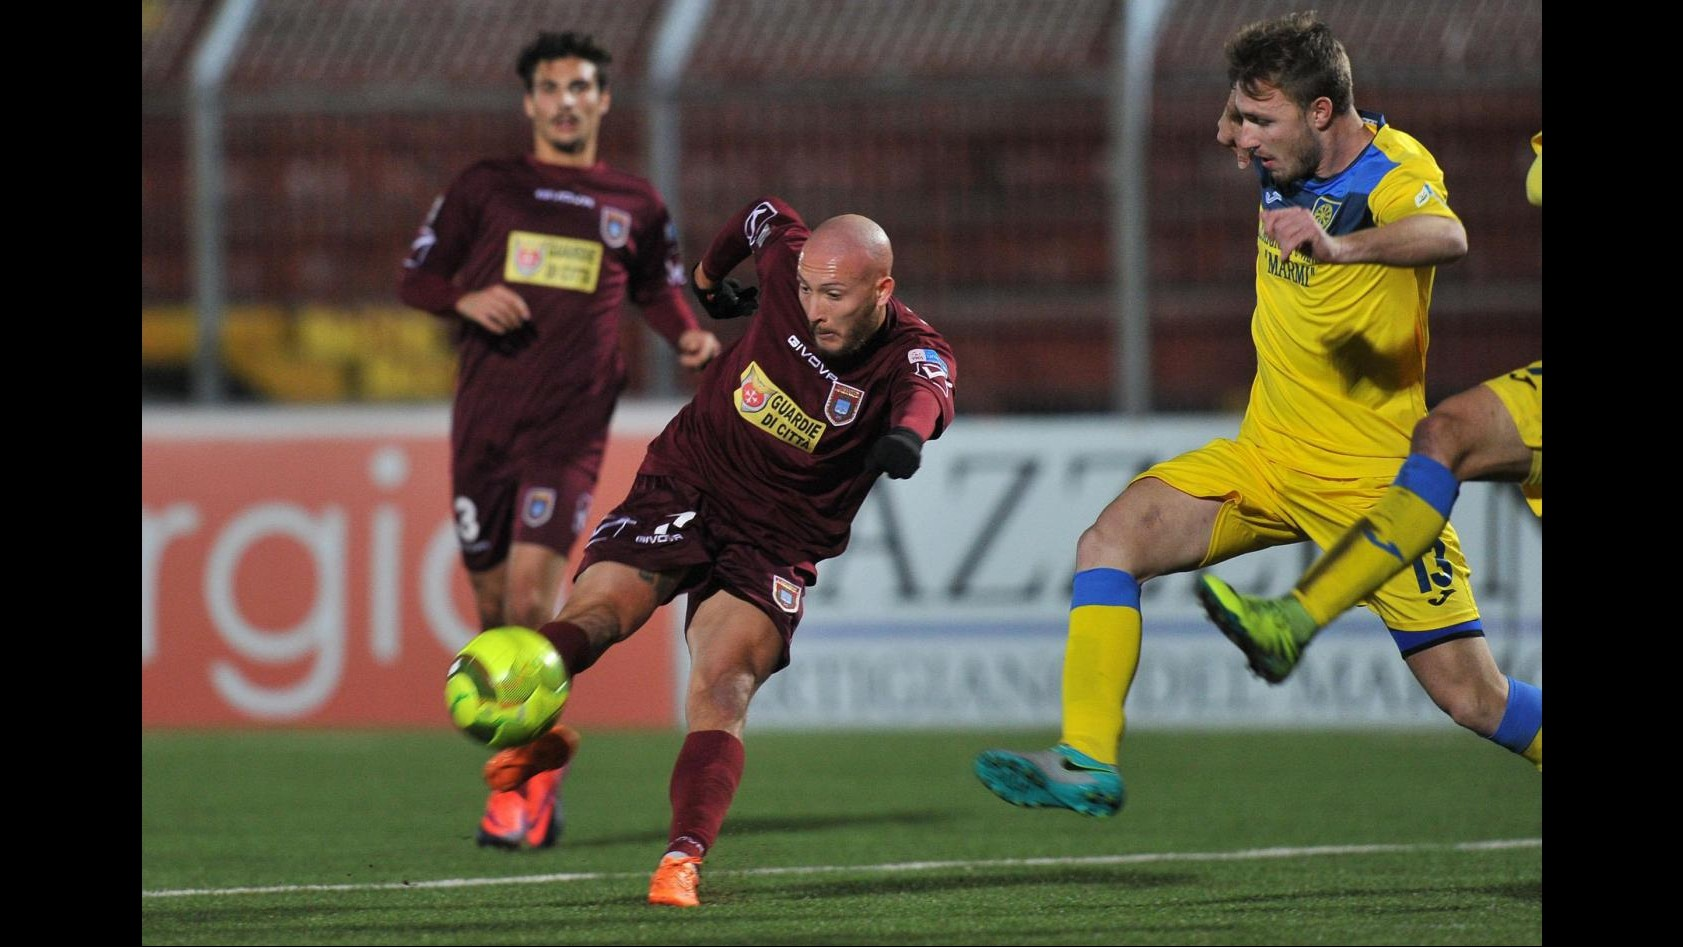 Lega Pro, tra Pontedera e Carrarese finisce 2-2